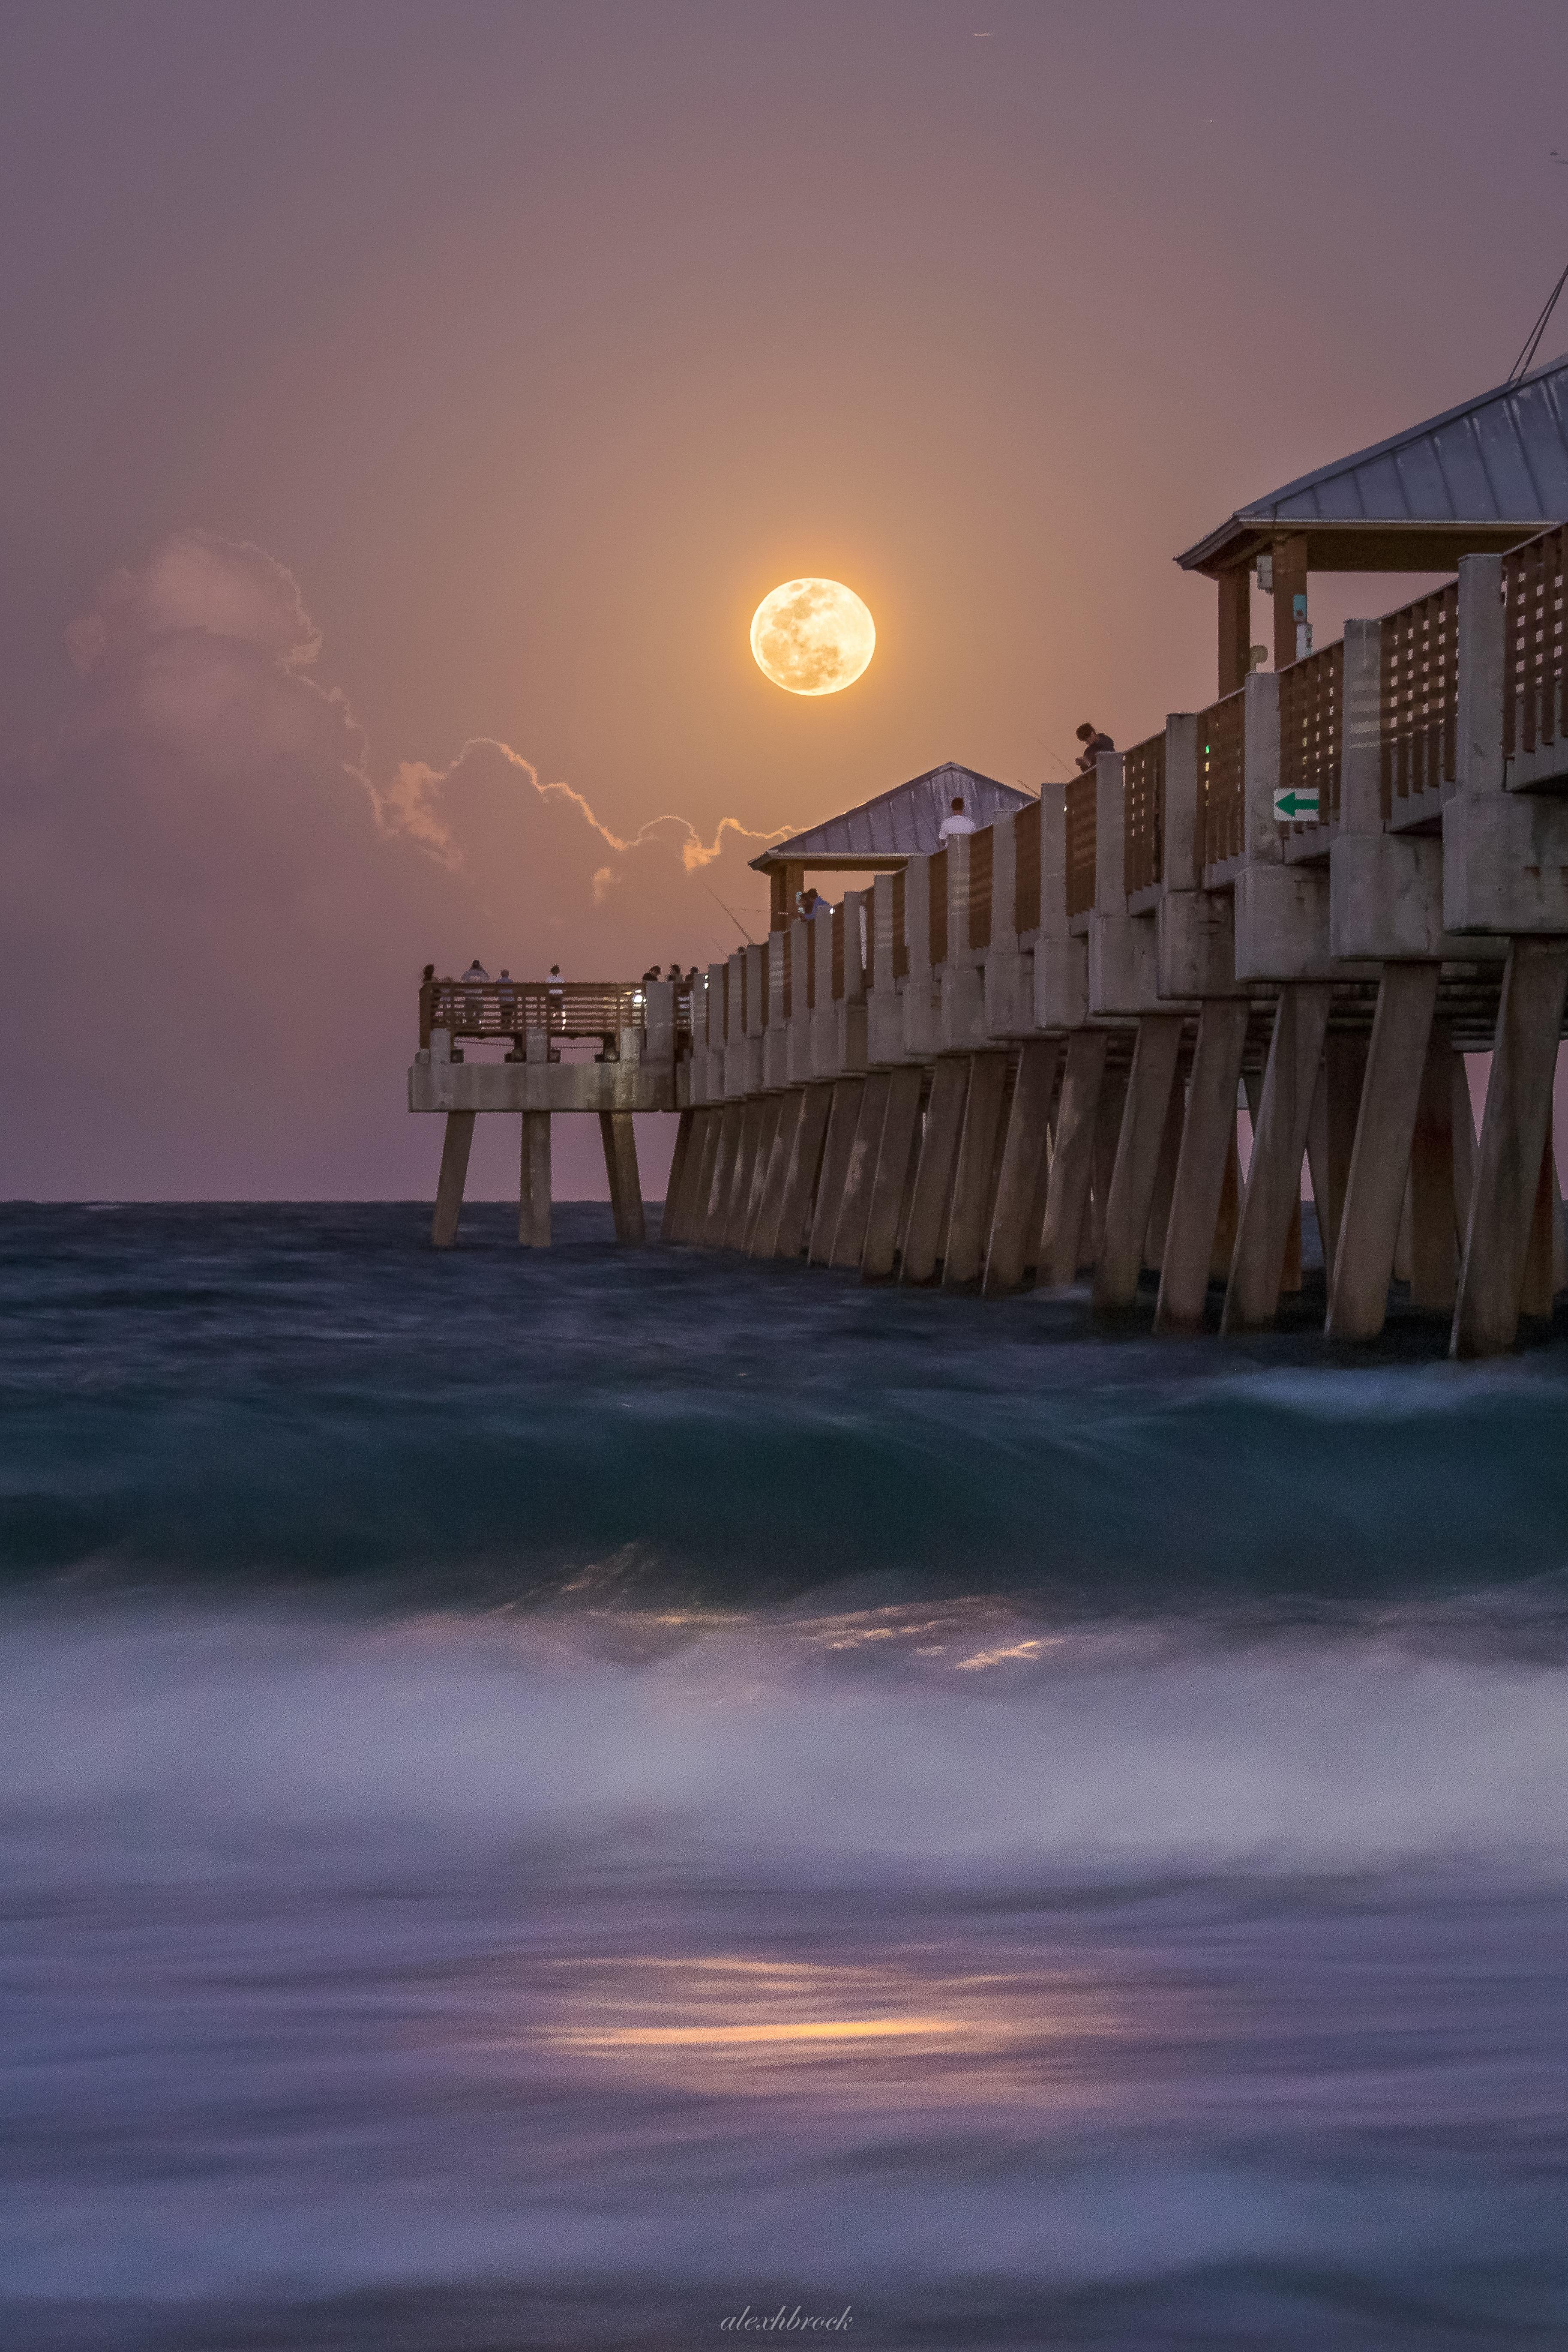 Juno Beach Pier Photo Contest Winner, Alex Brock.